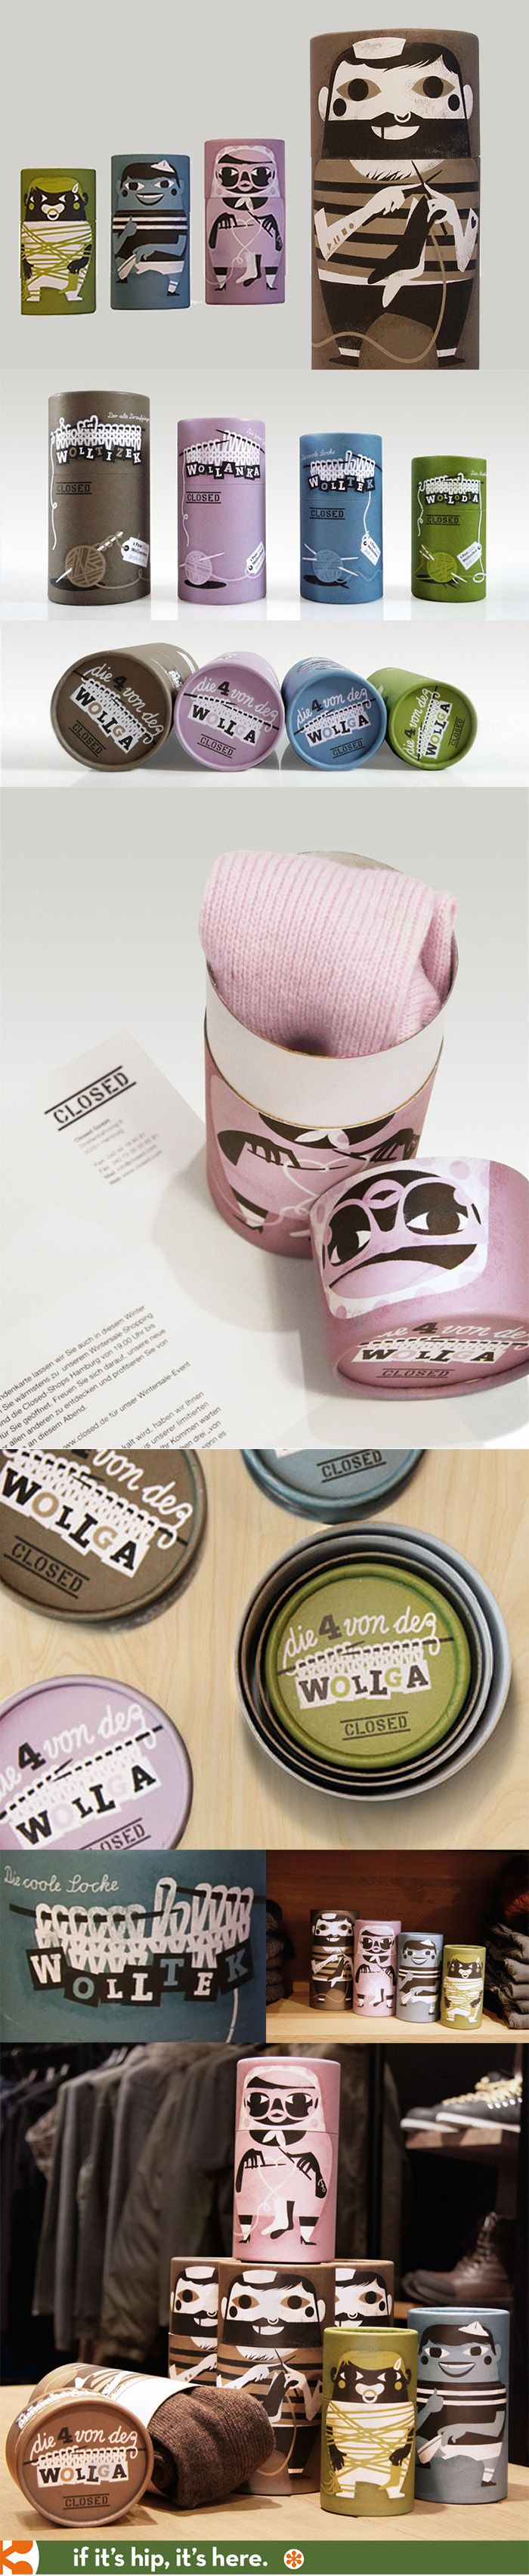 Beautiful packaging for CLOSED brand wool socks by Gürtler ...